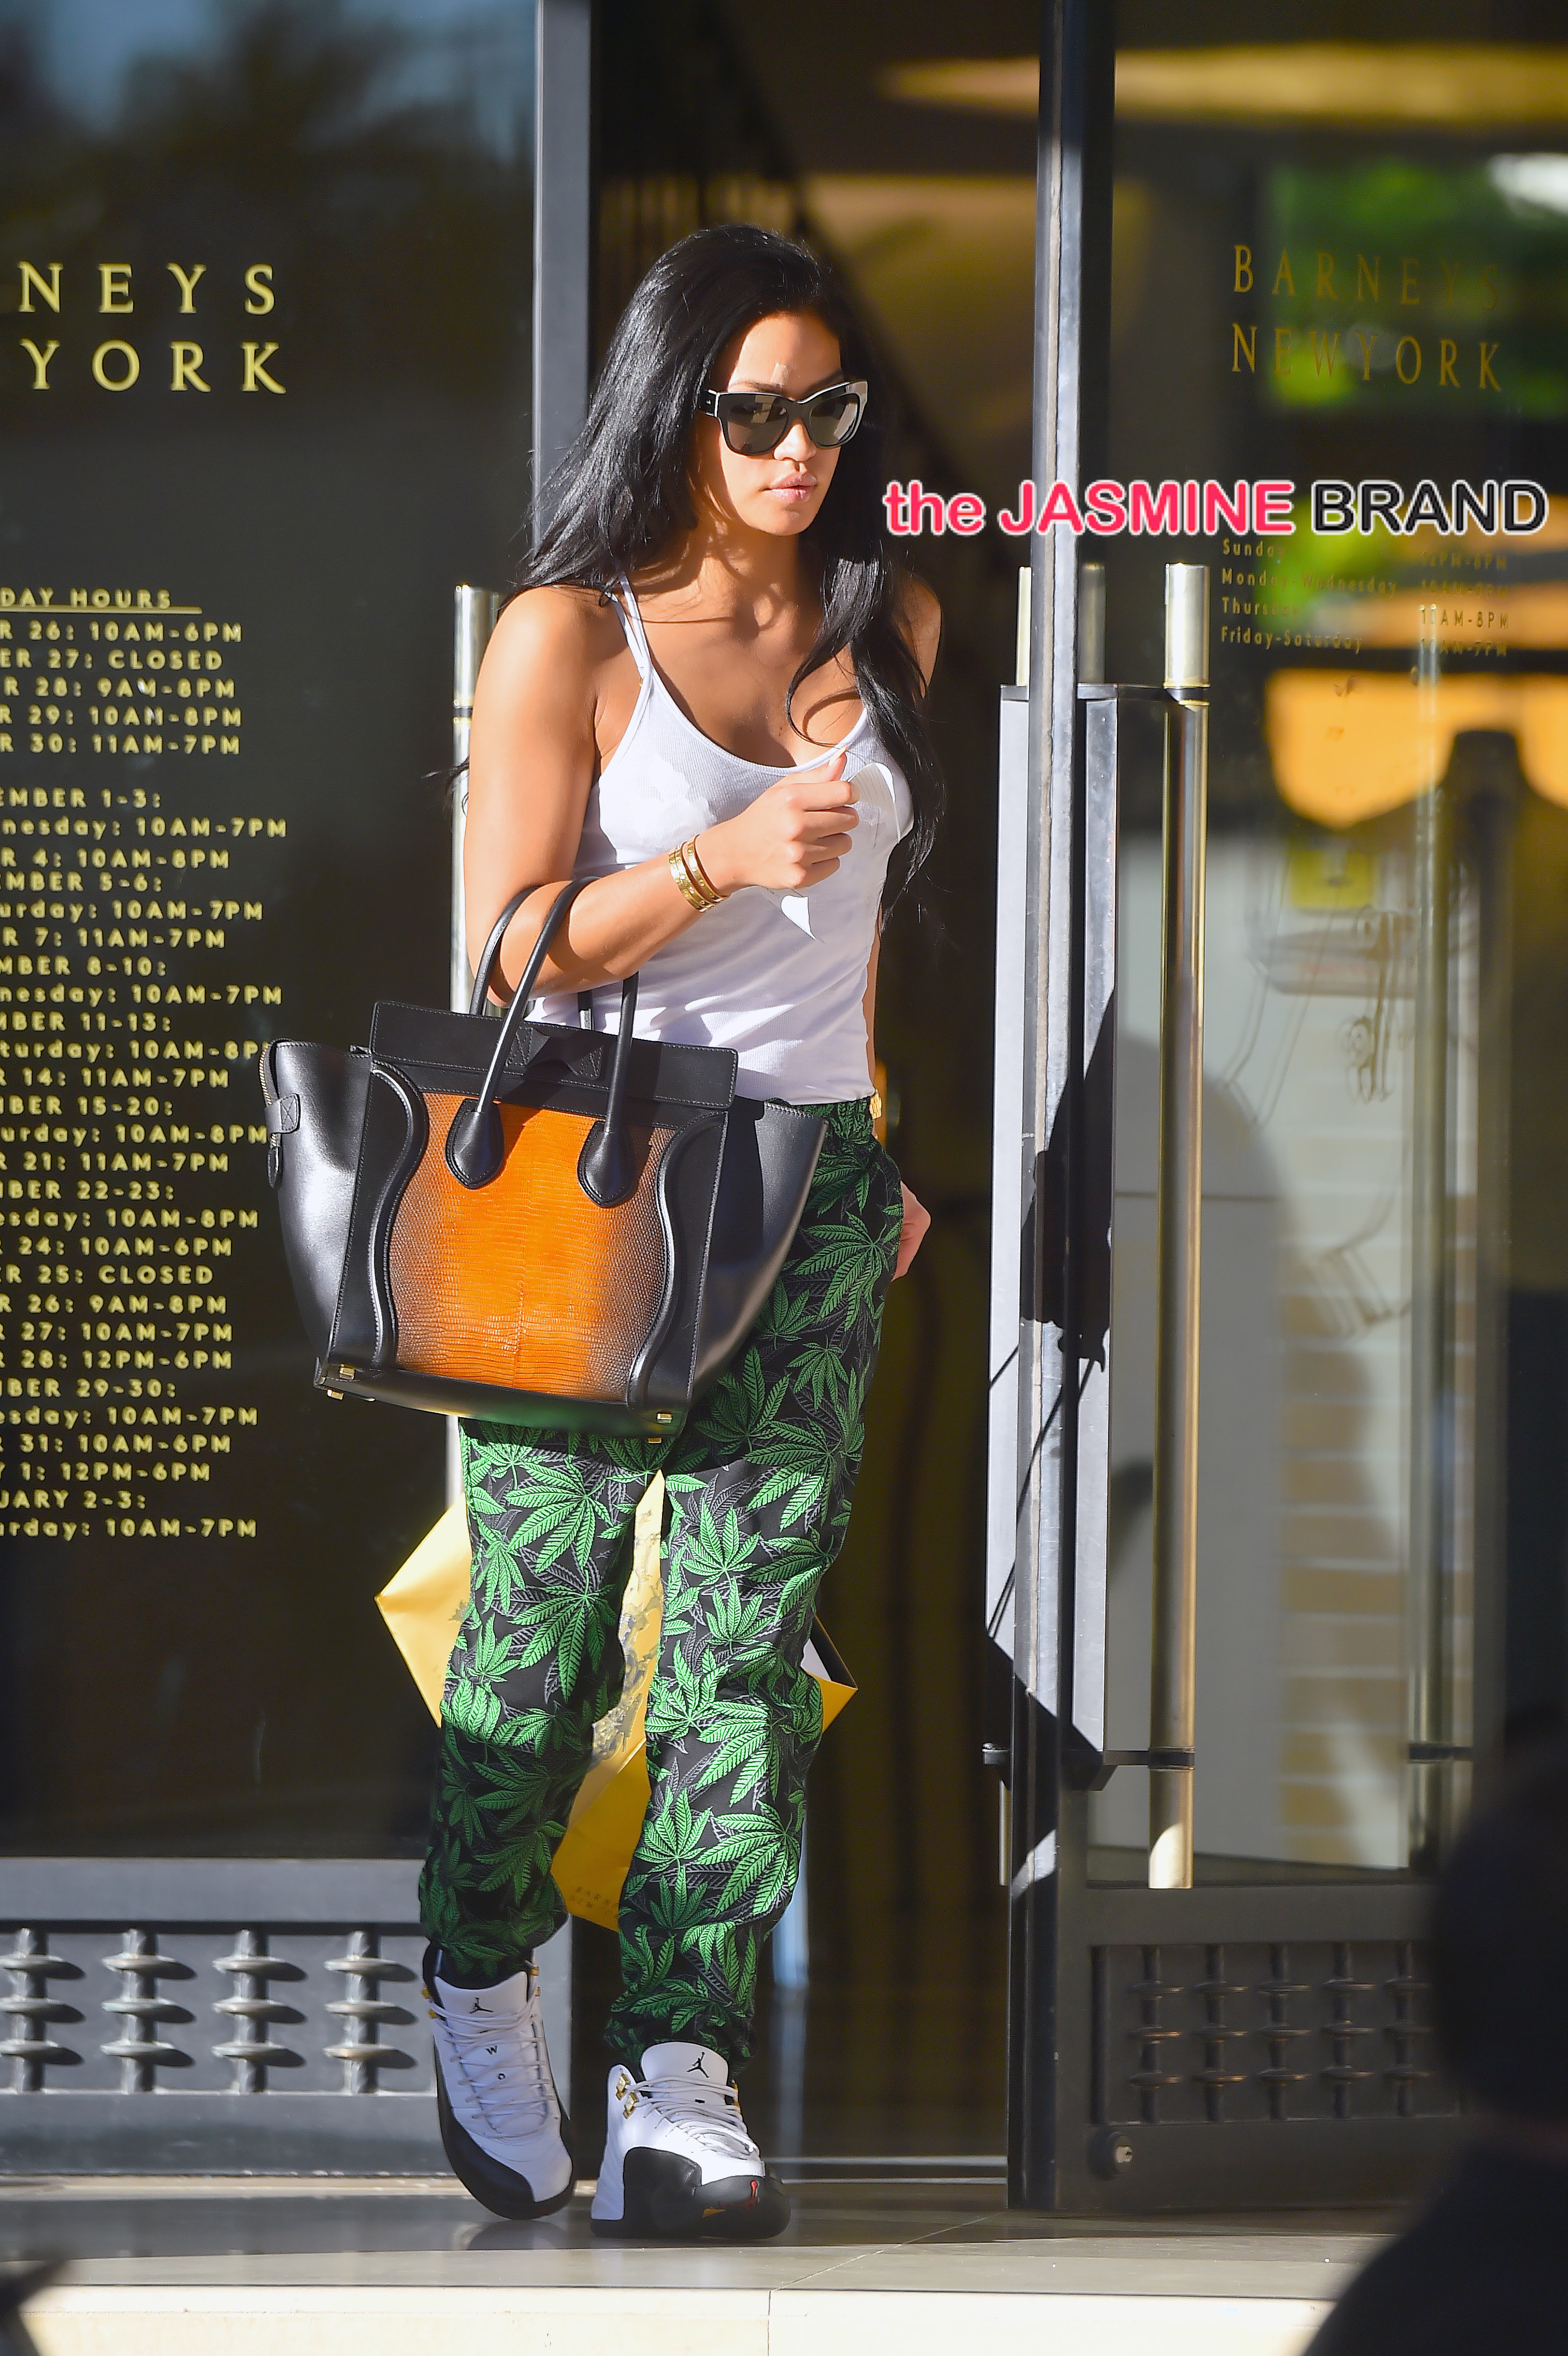 Cassie wears pants with printed marijuana leaves as she shops Barneys